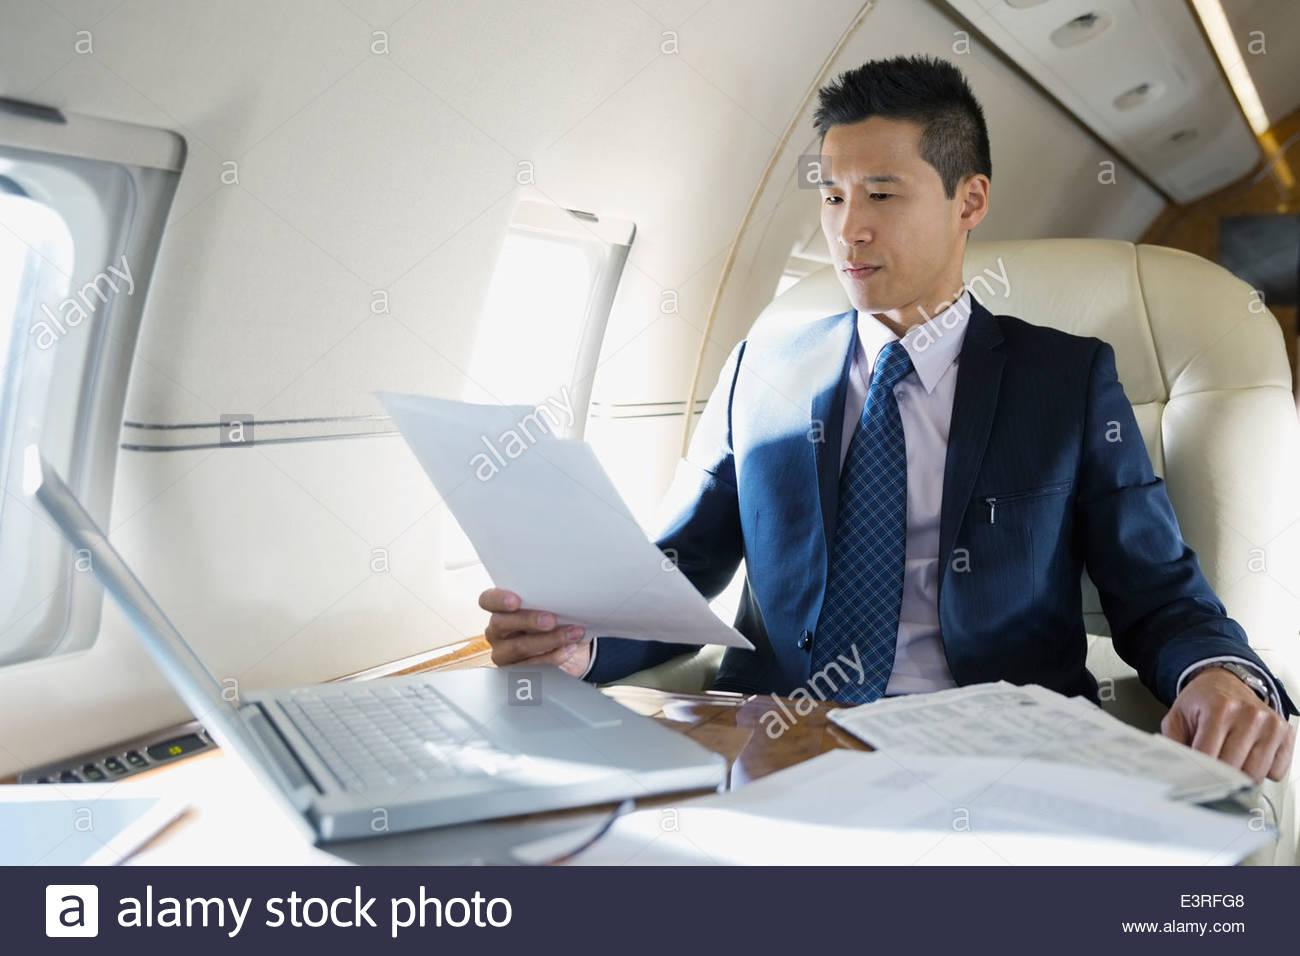 Businessman working on corporate jet - Stock Image